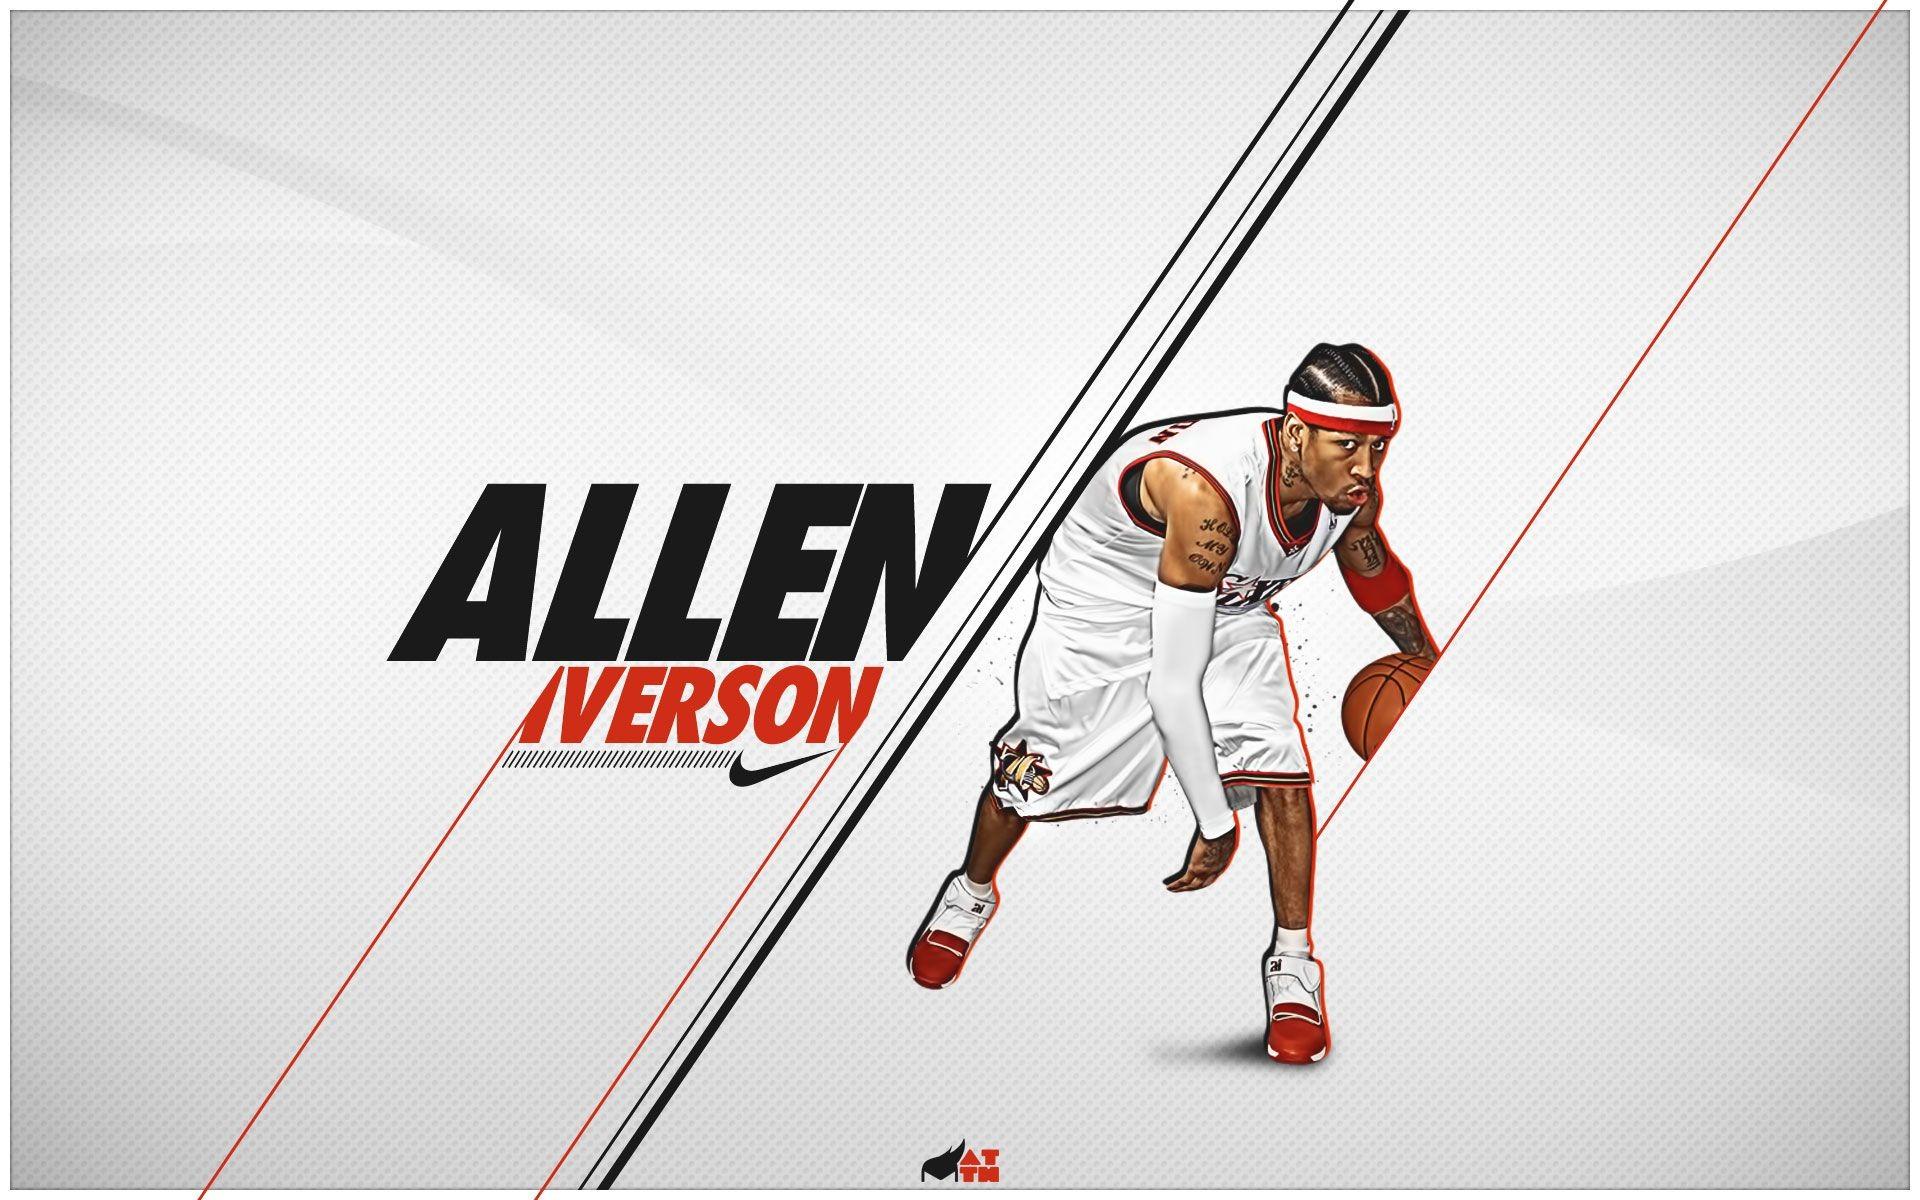 Allen Iverson Wallpaper Hd Wallpapersafari. Allen iverson wallpaper –  1920×1200. Download